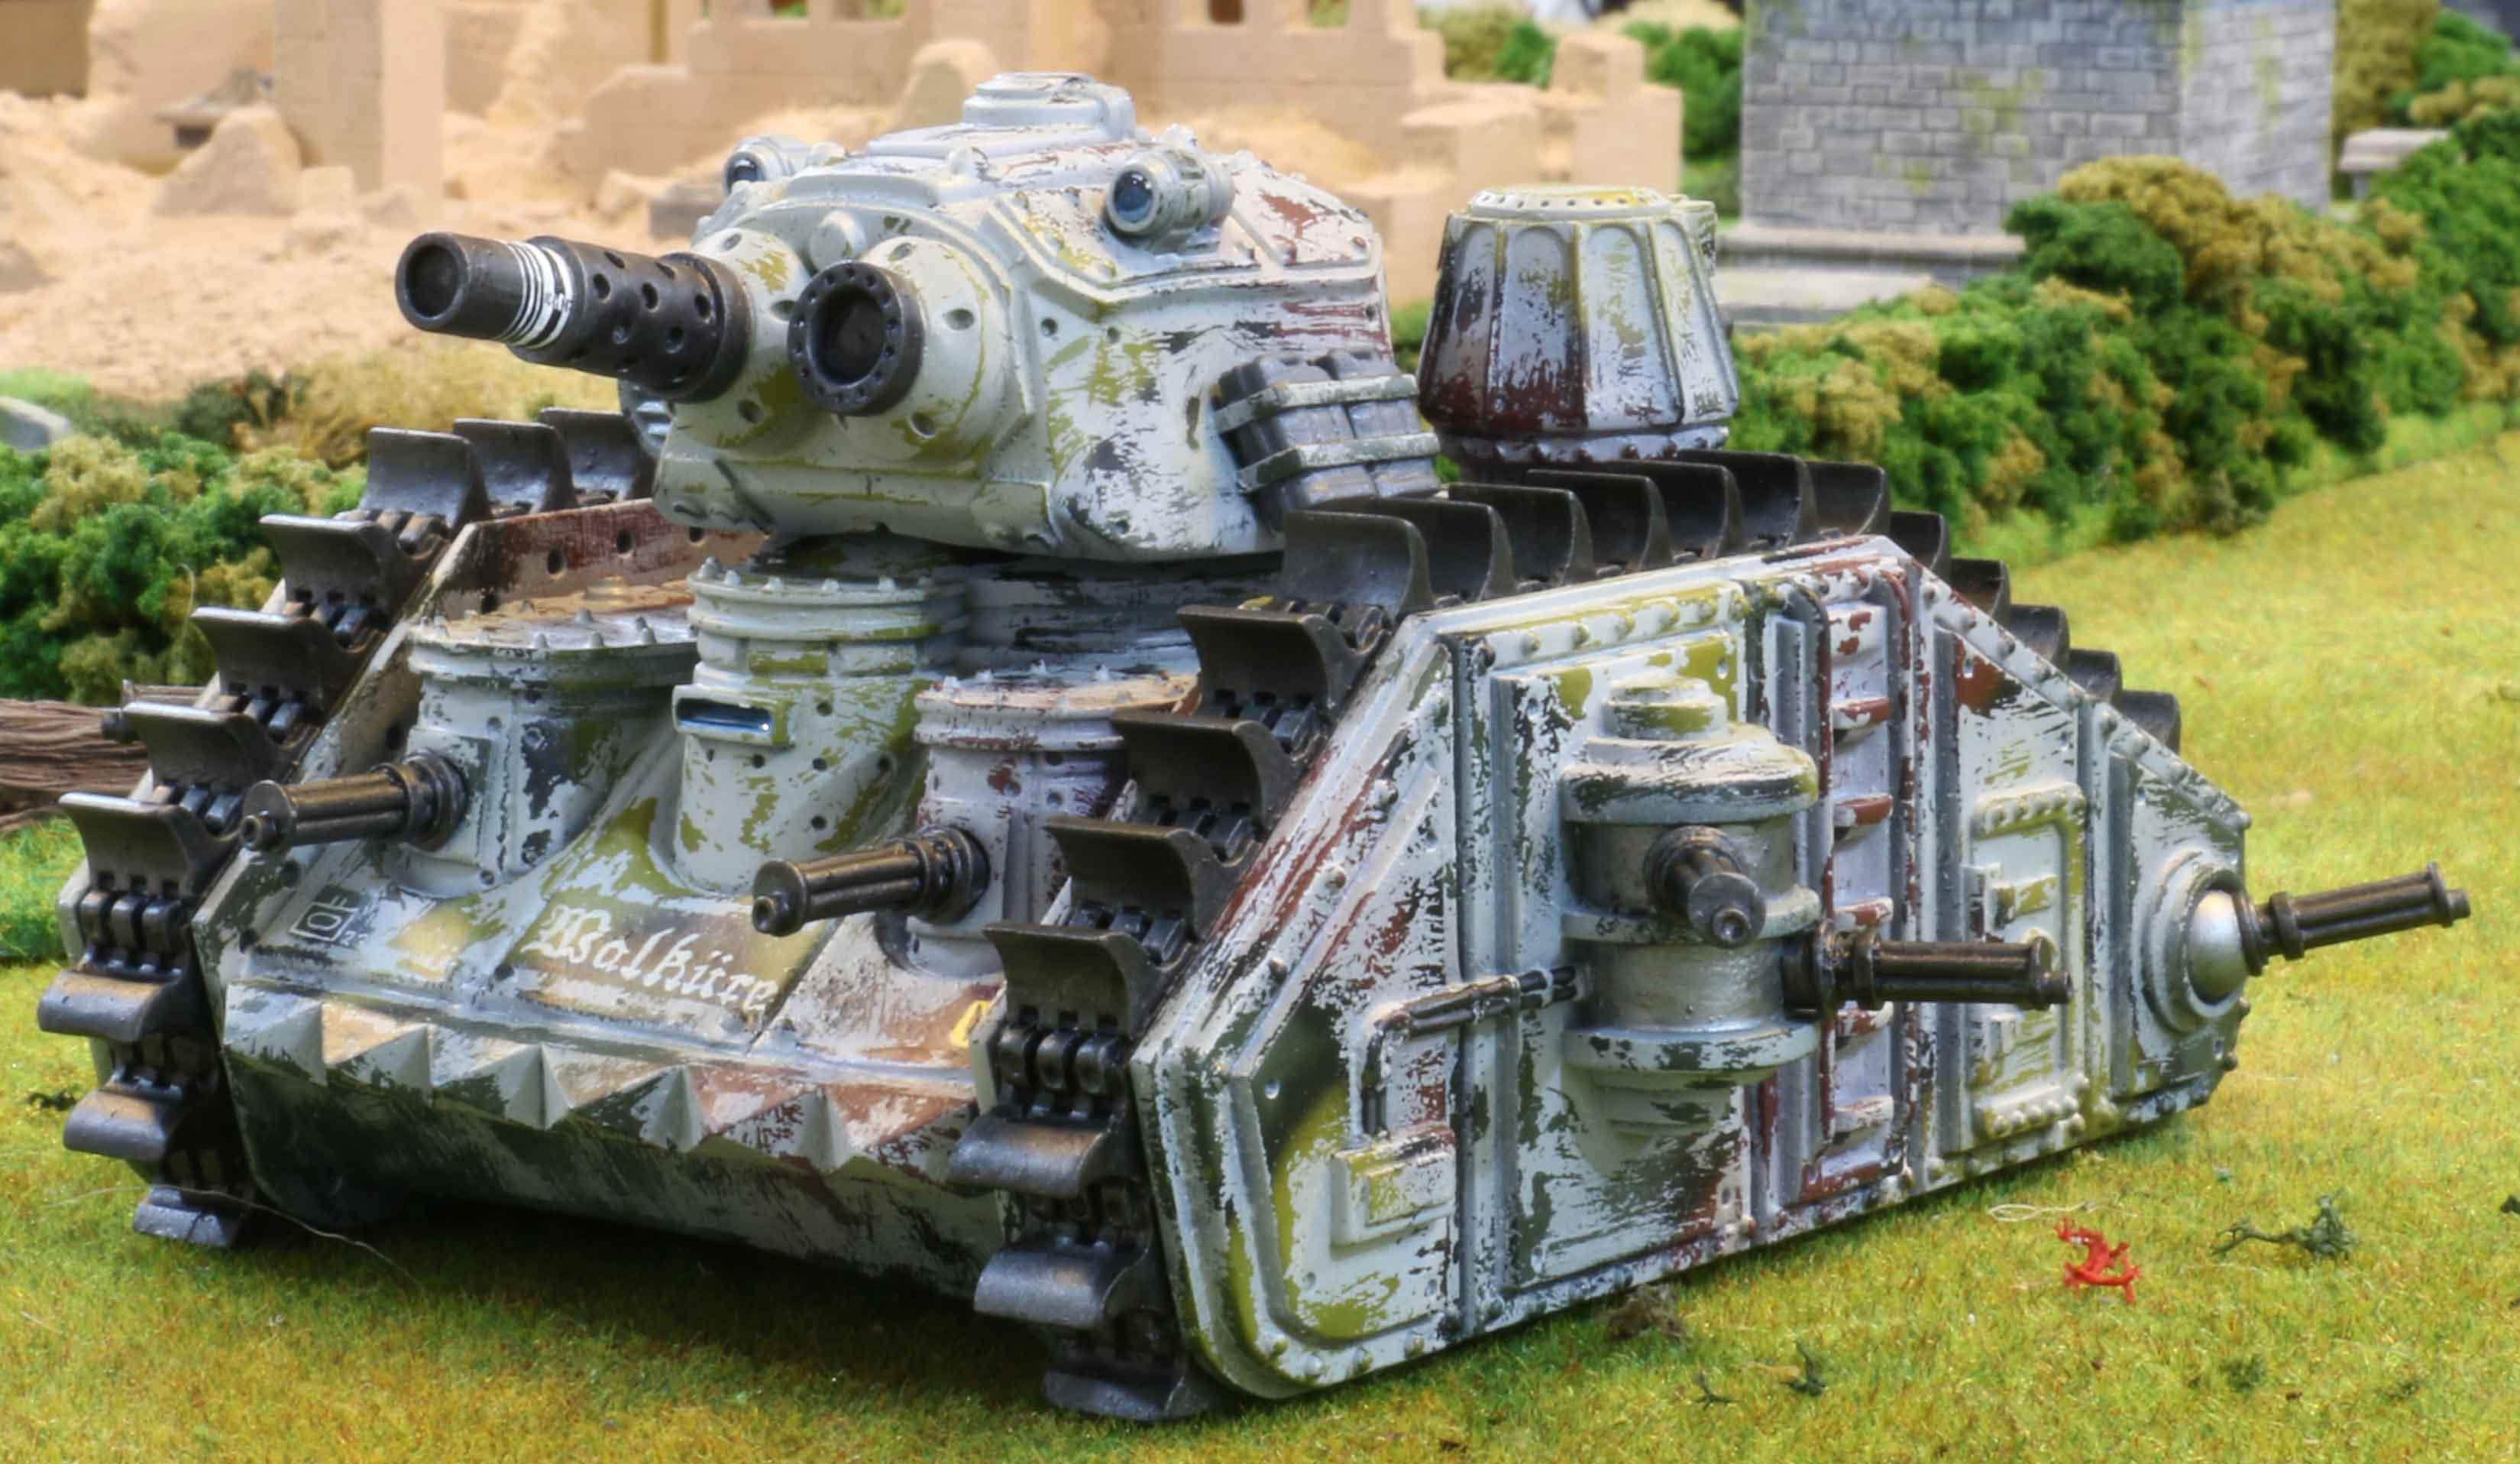 Bauhaus gbt 49 grizzly tank dhcwargamesblog - Deco kamer truc ...